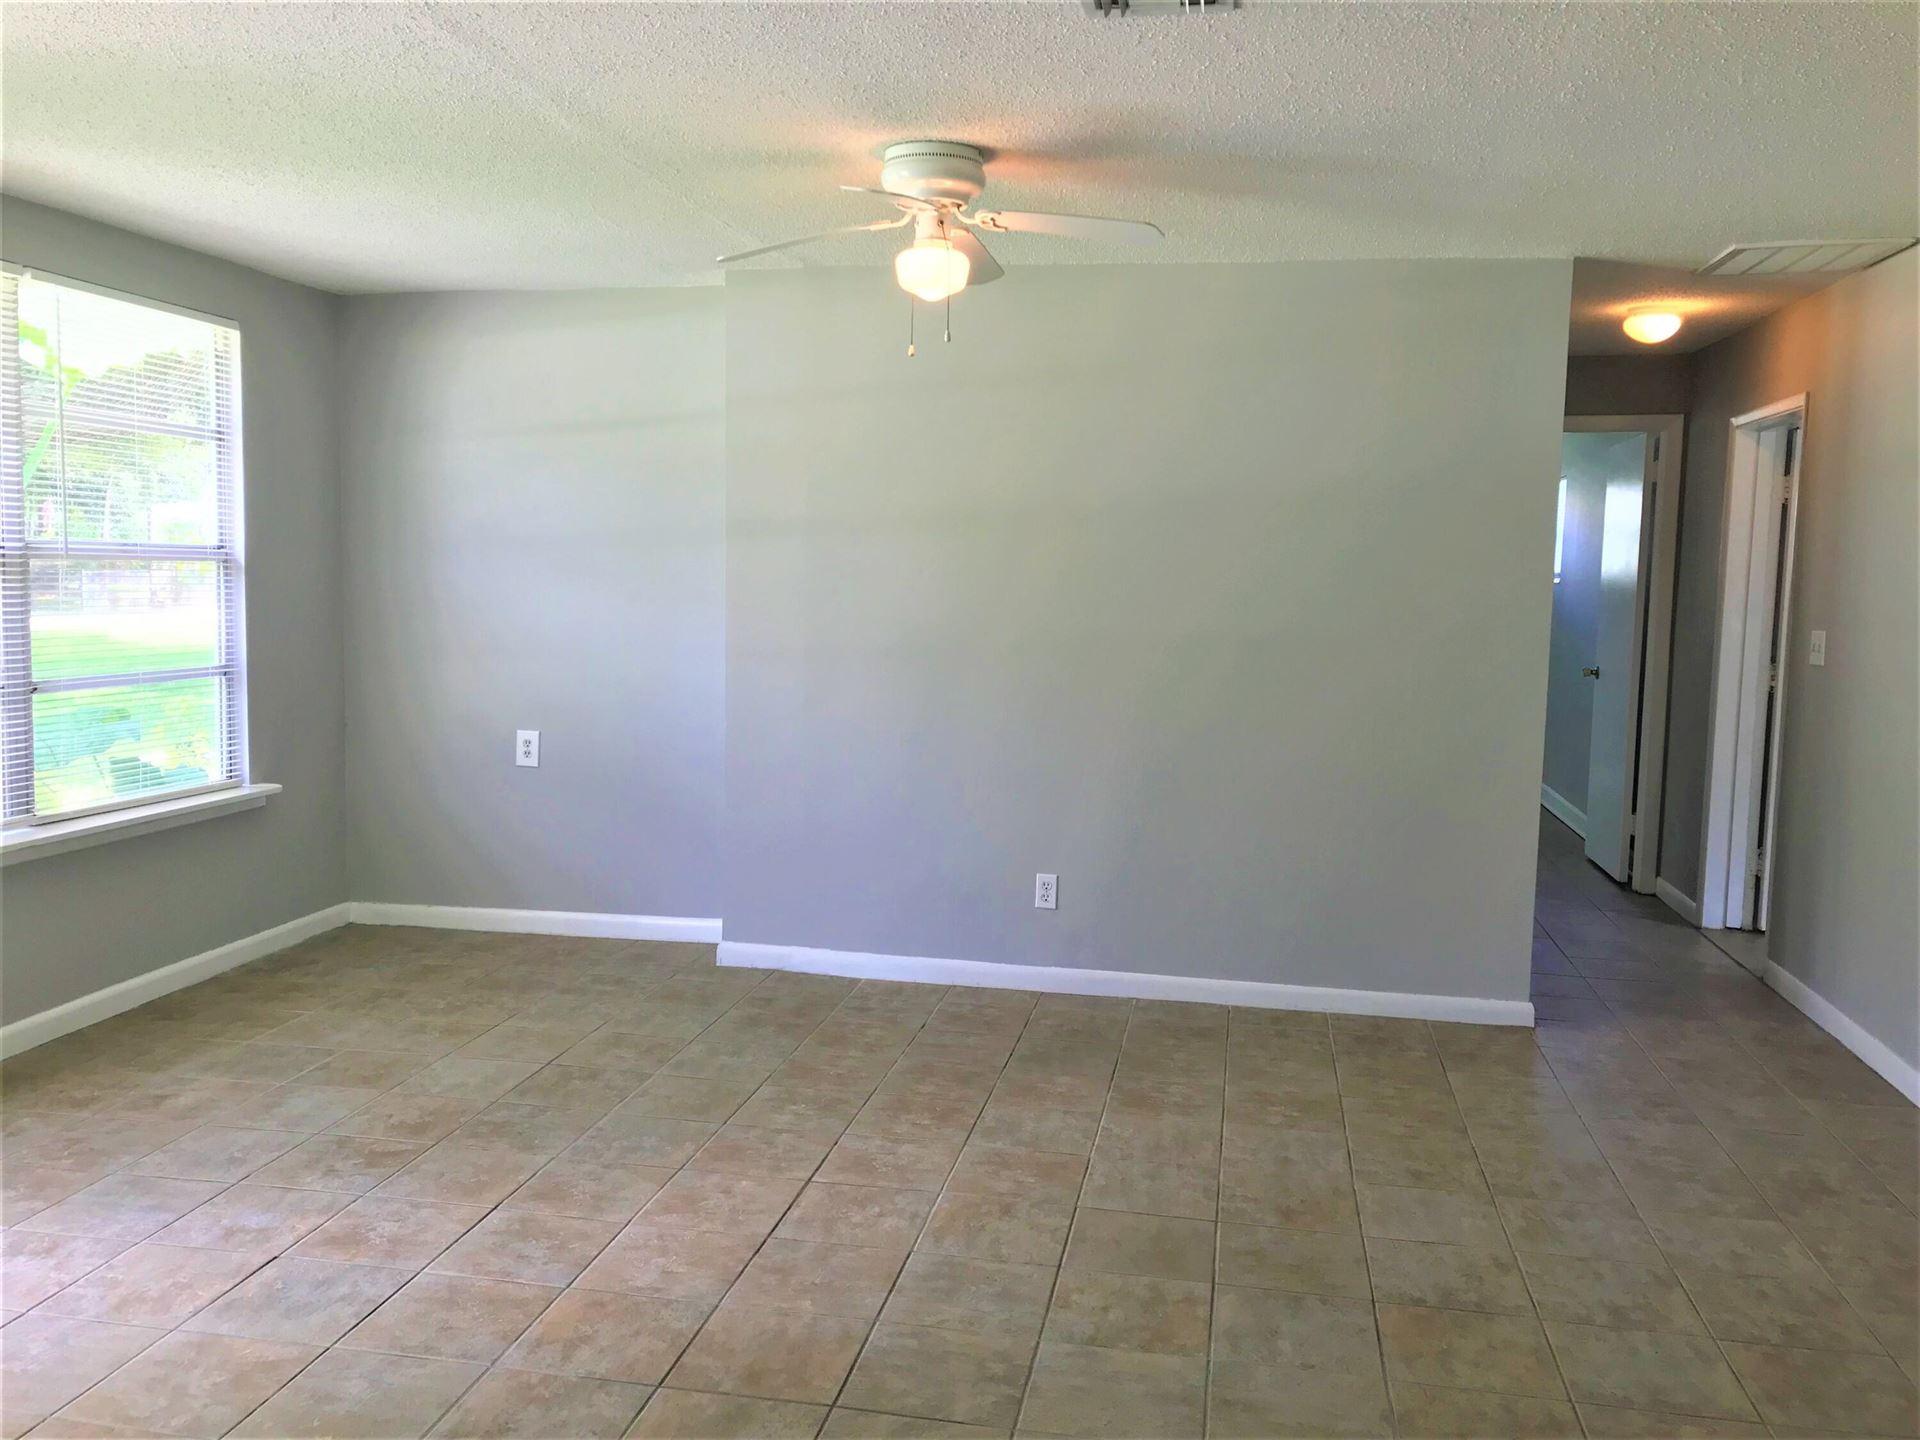 Photo of 1435 6th Street, Vero Beach, FL 32962 (MLS # RX-10745839)